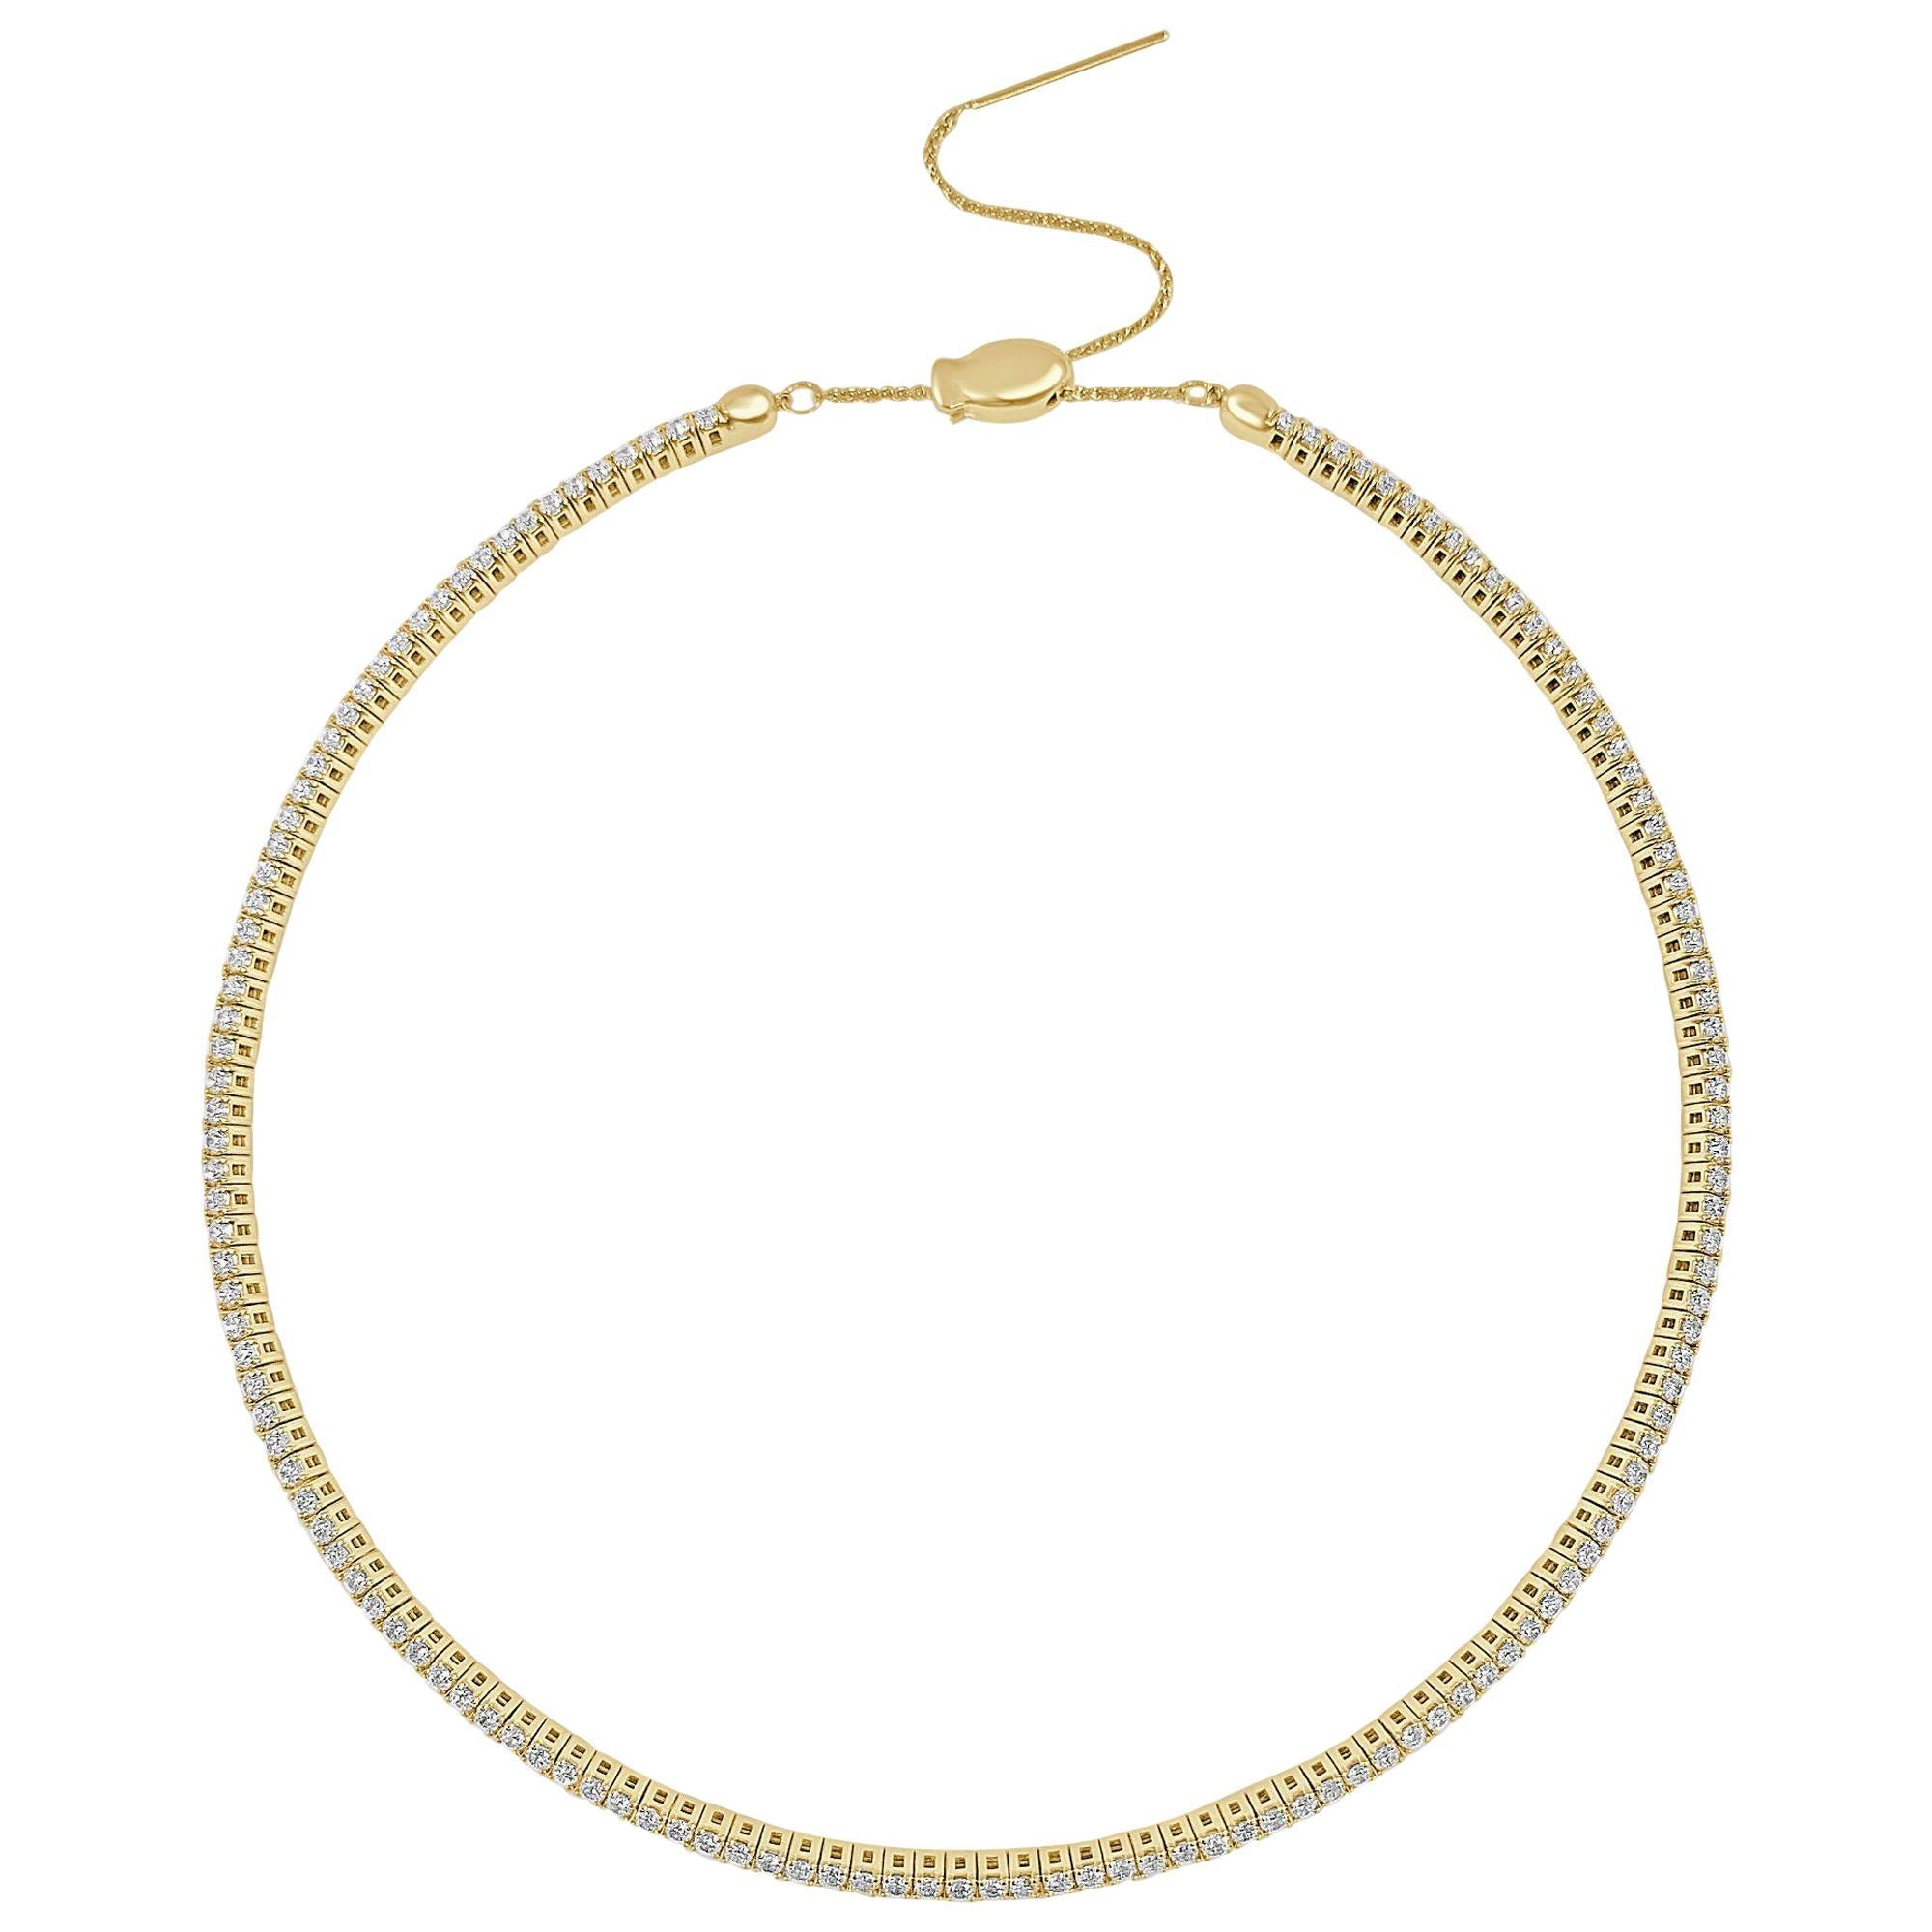 18 Karat Yellow Gold 3.56 Carat Flexible Diamond Choker Collar Necklace